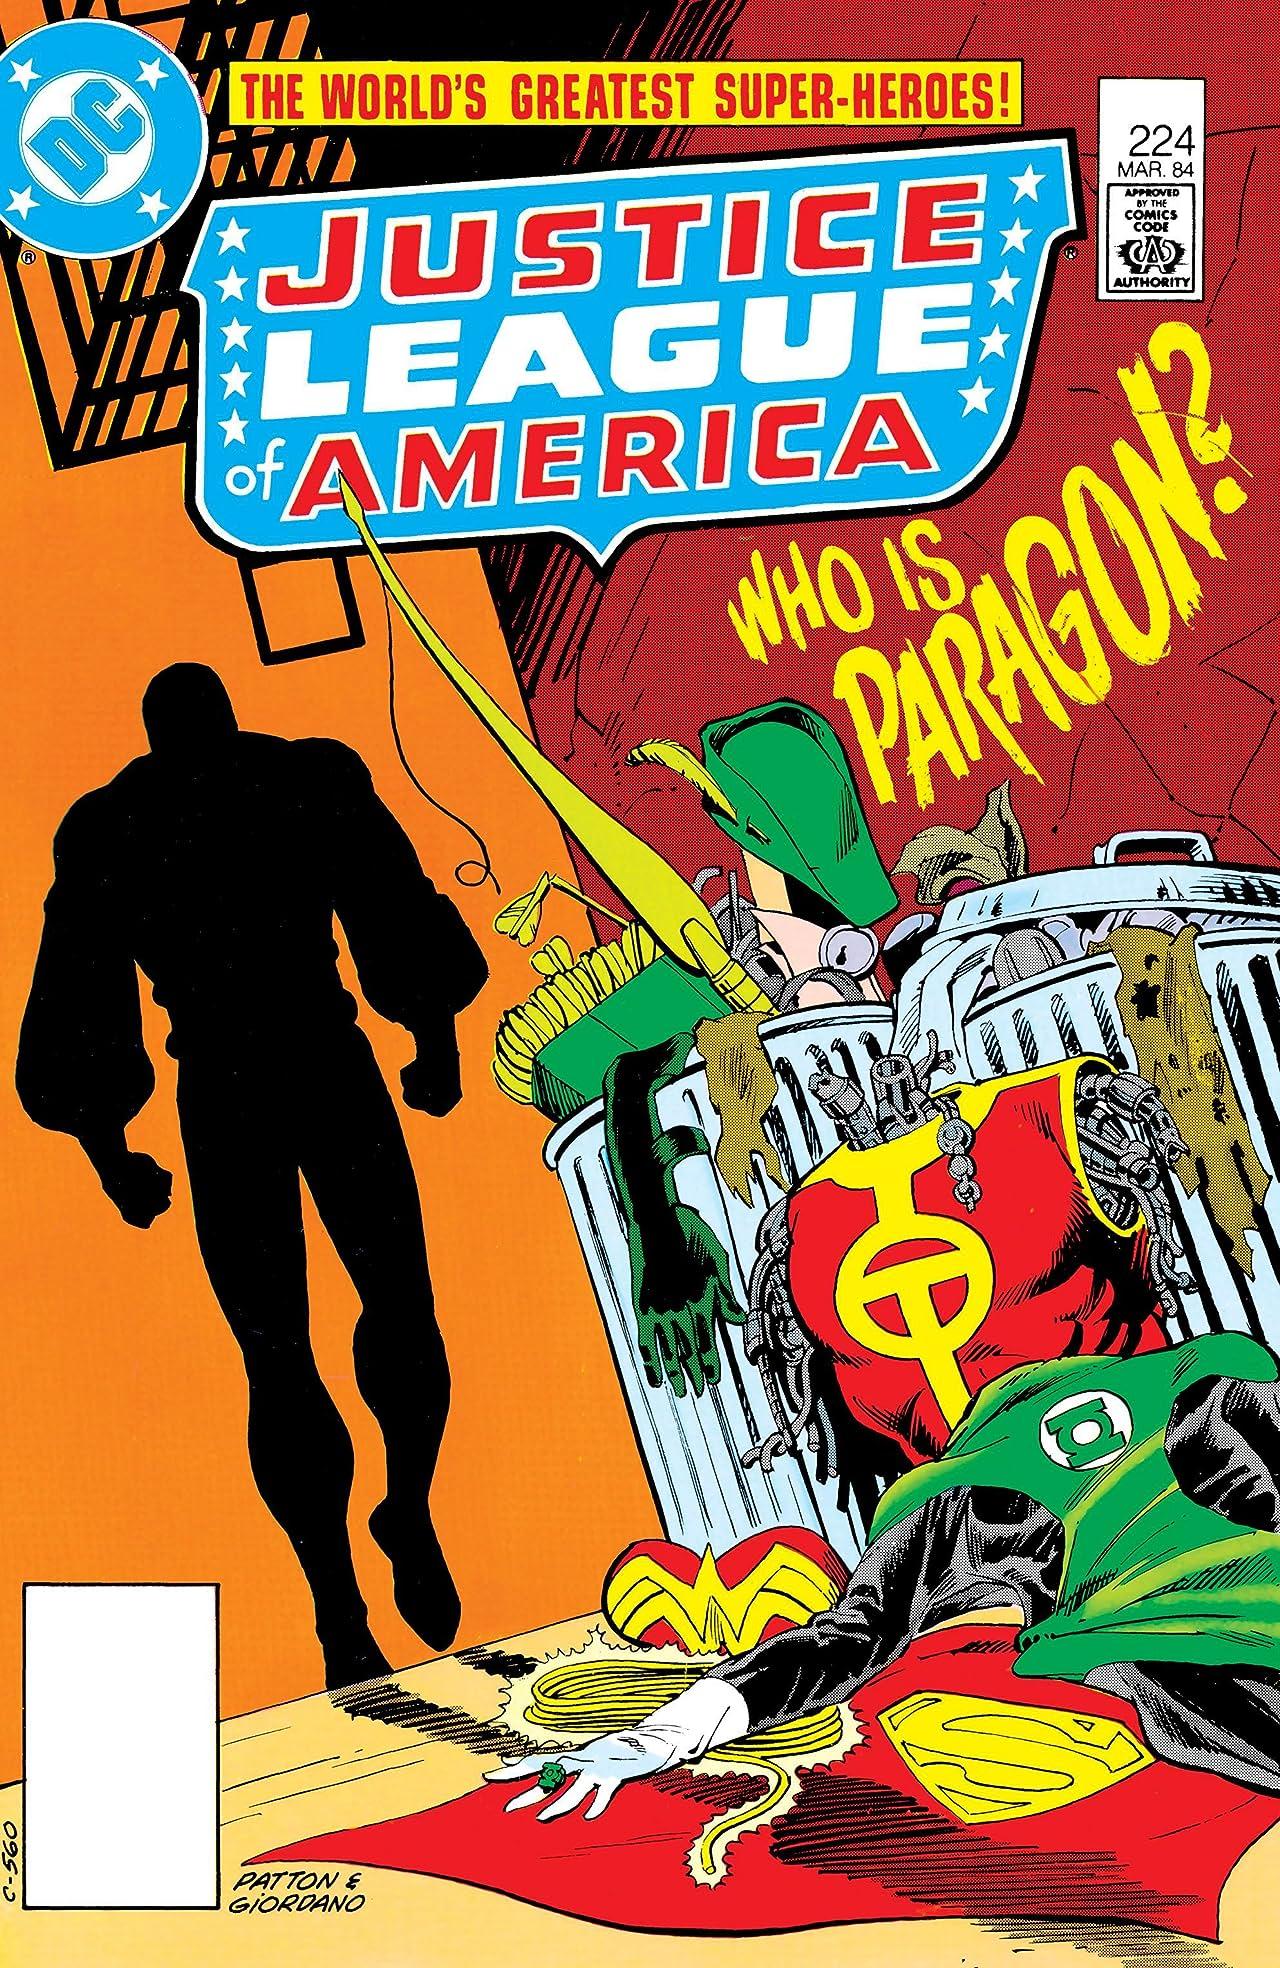 Justice League of America (1960-1987) #224